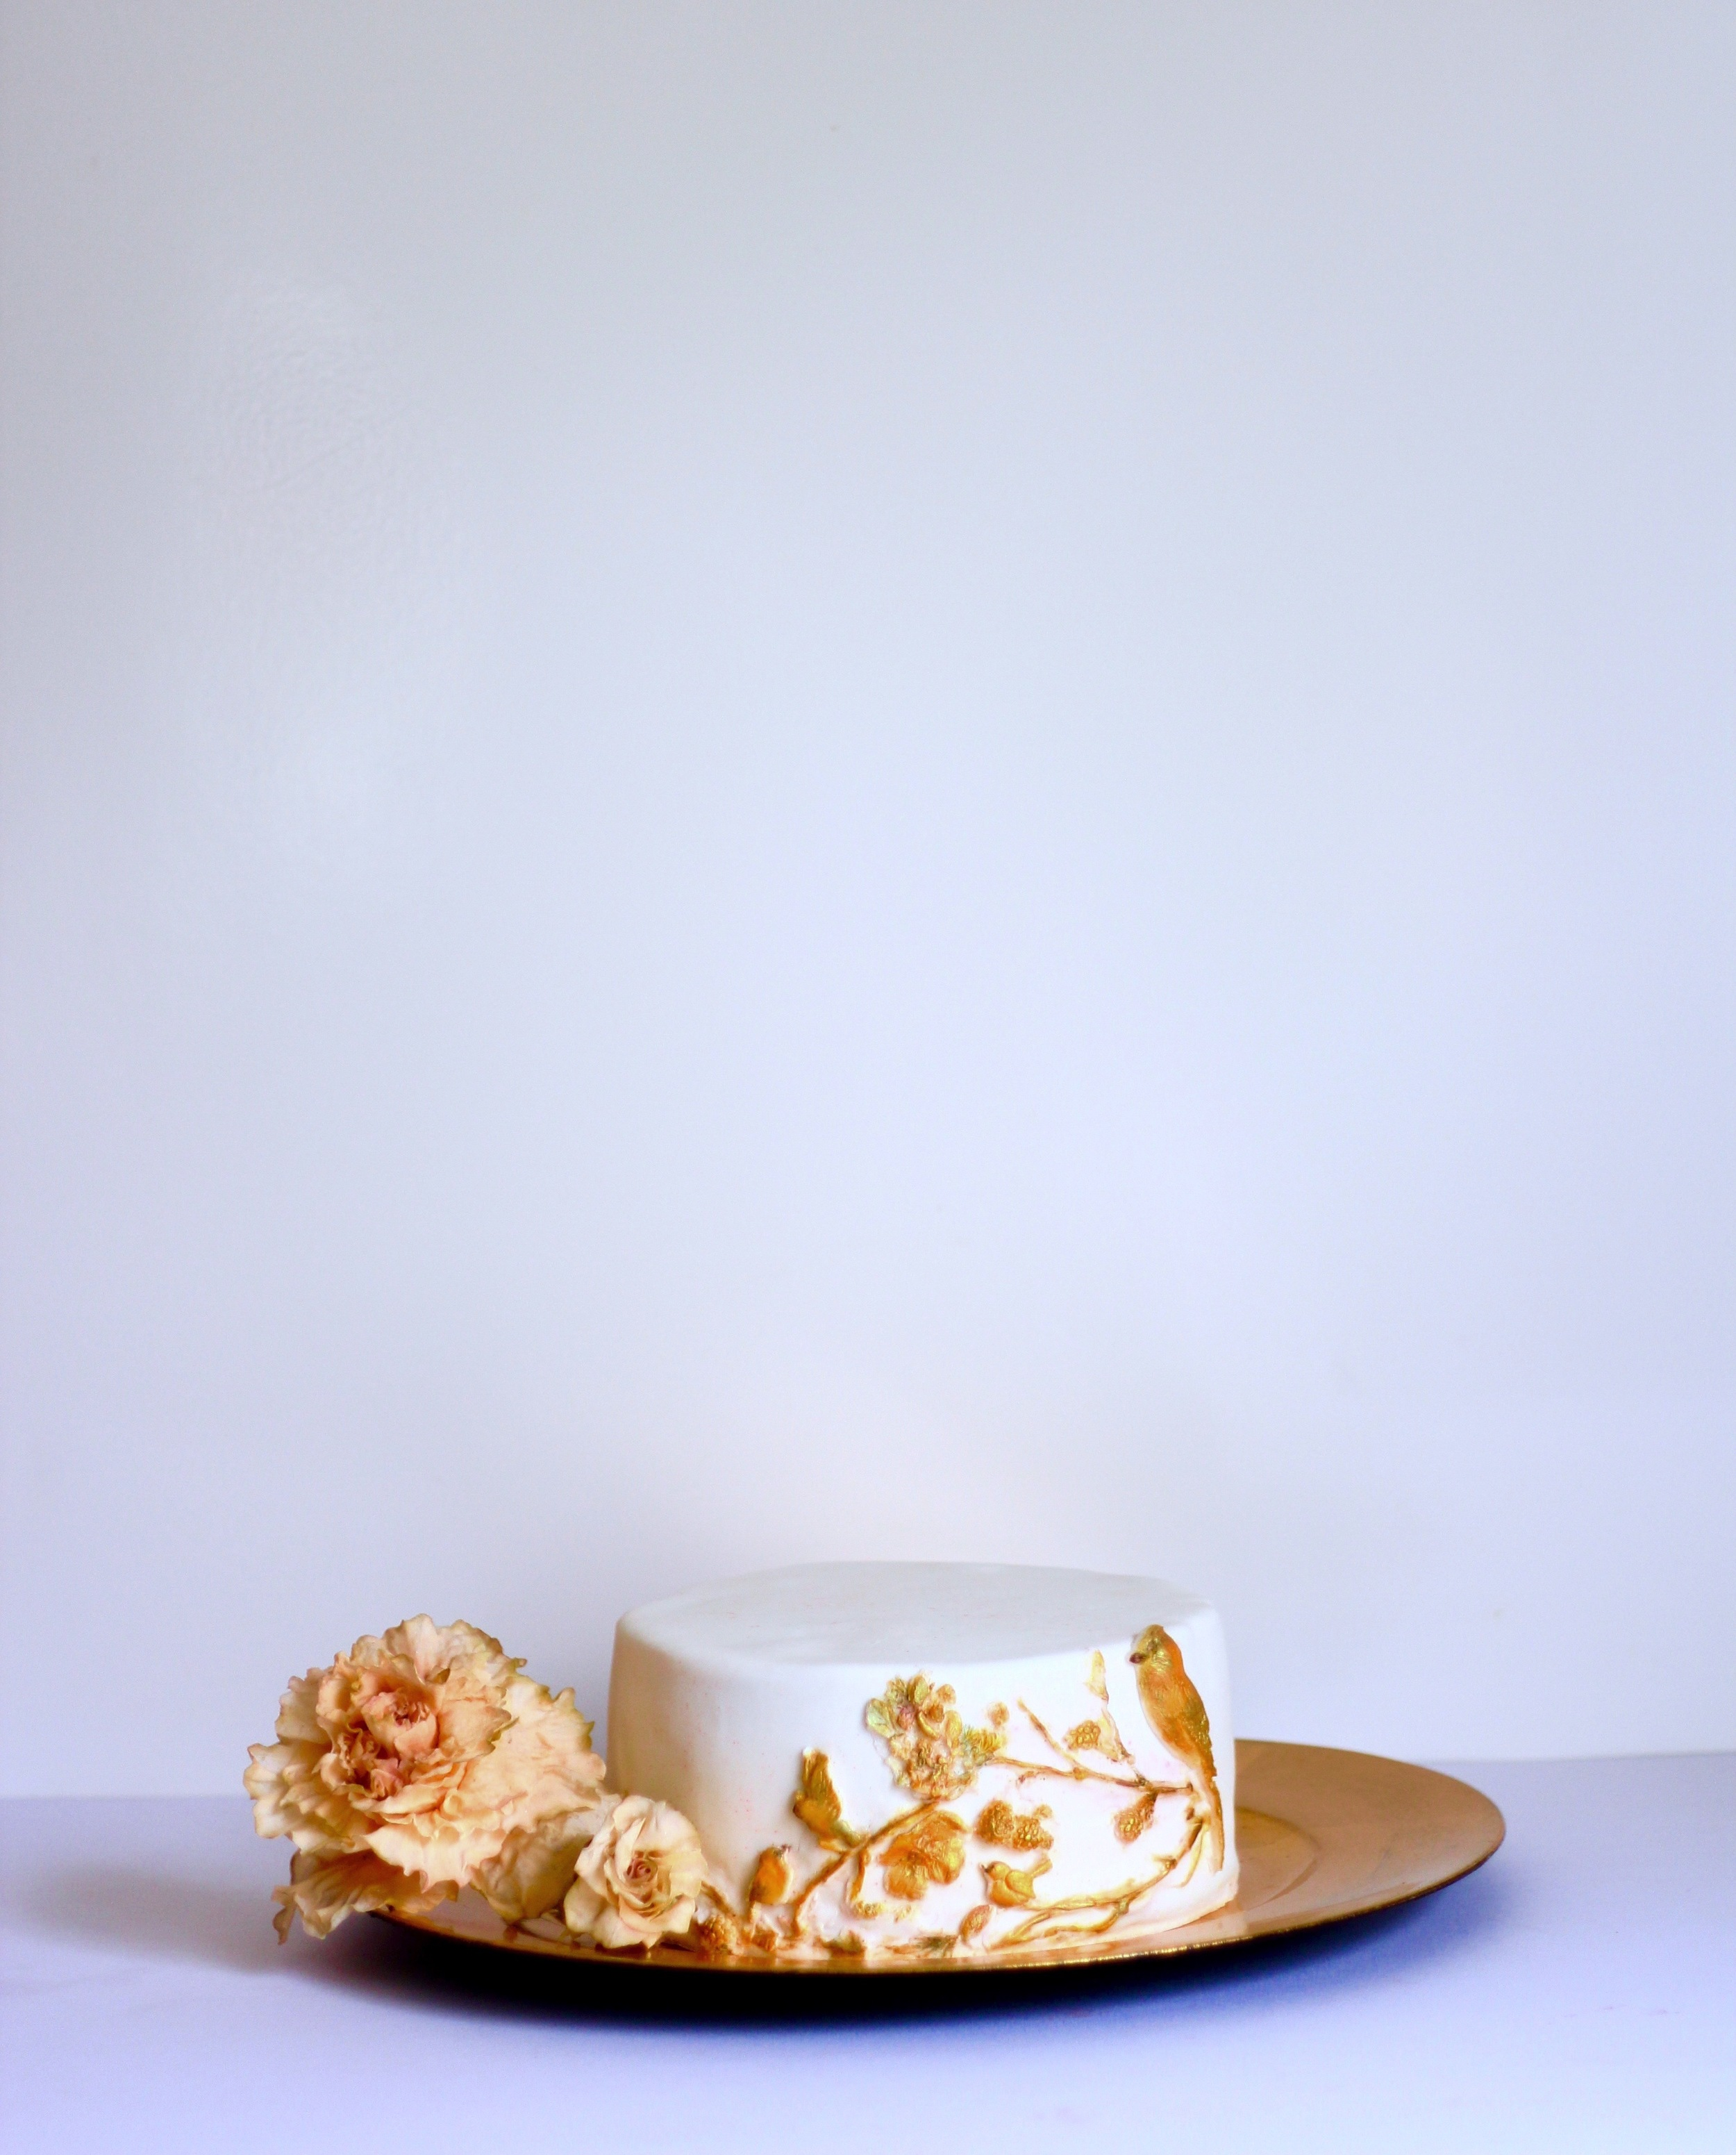 trinidad and tobago cake artist jaime gerard cake's golden bird cake